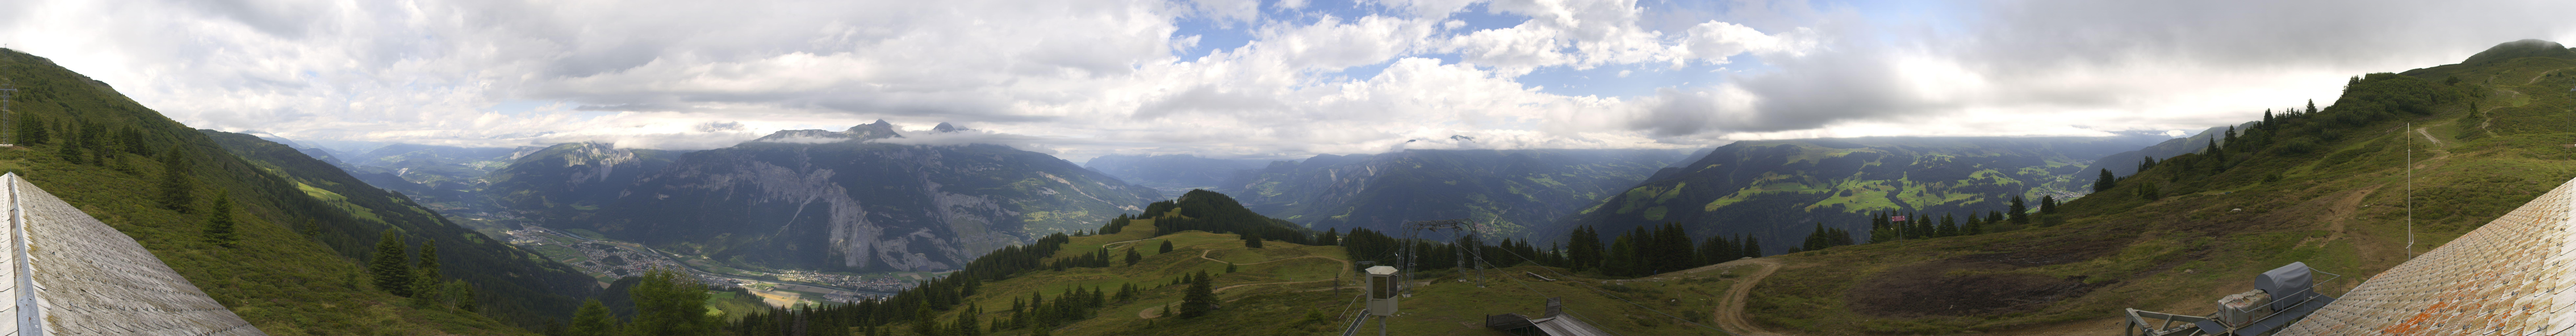 Churwalden: Chur Bergbahnen (Brambrüesch)